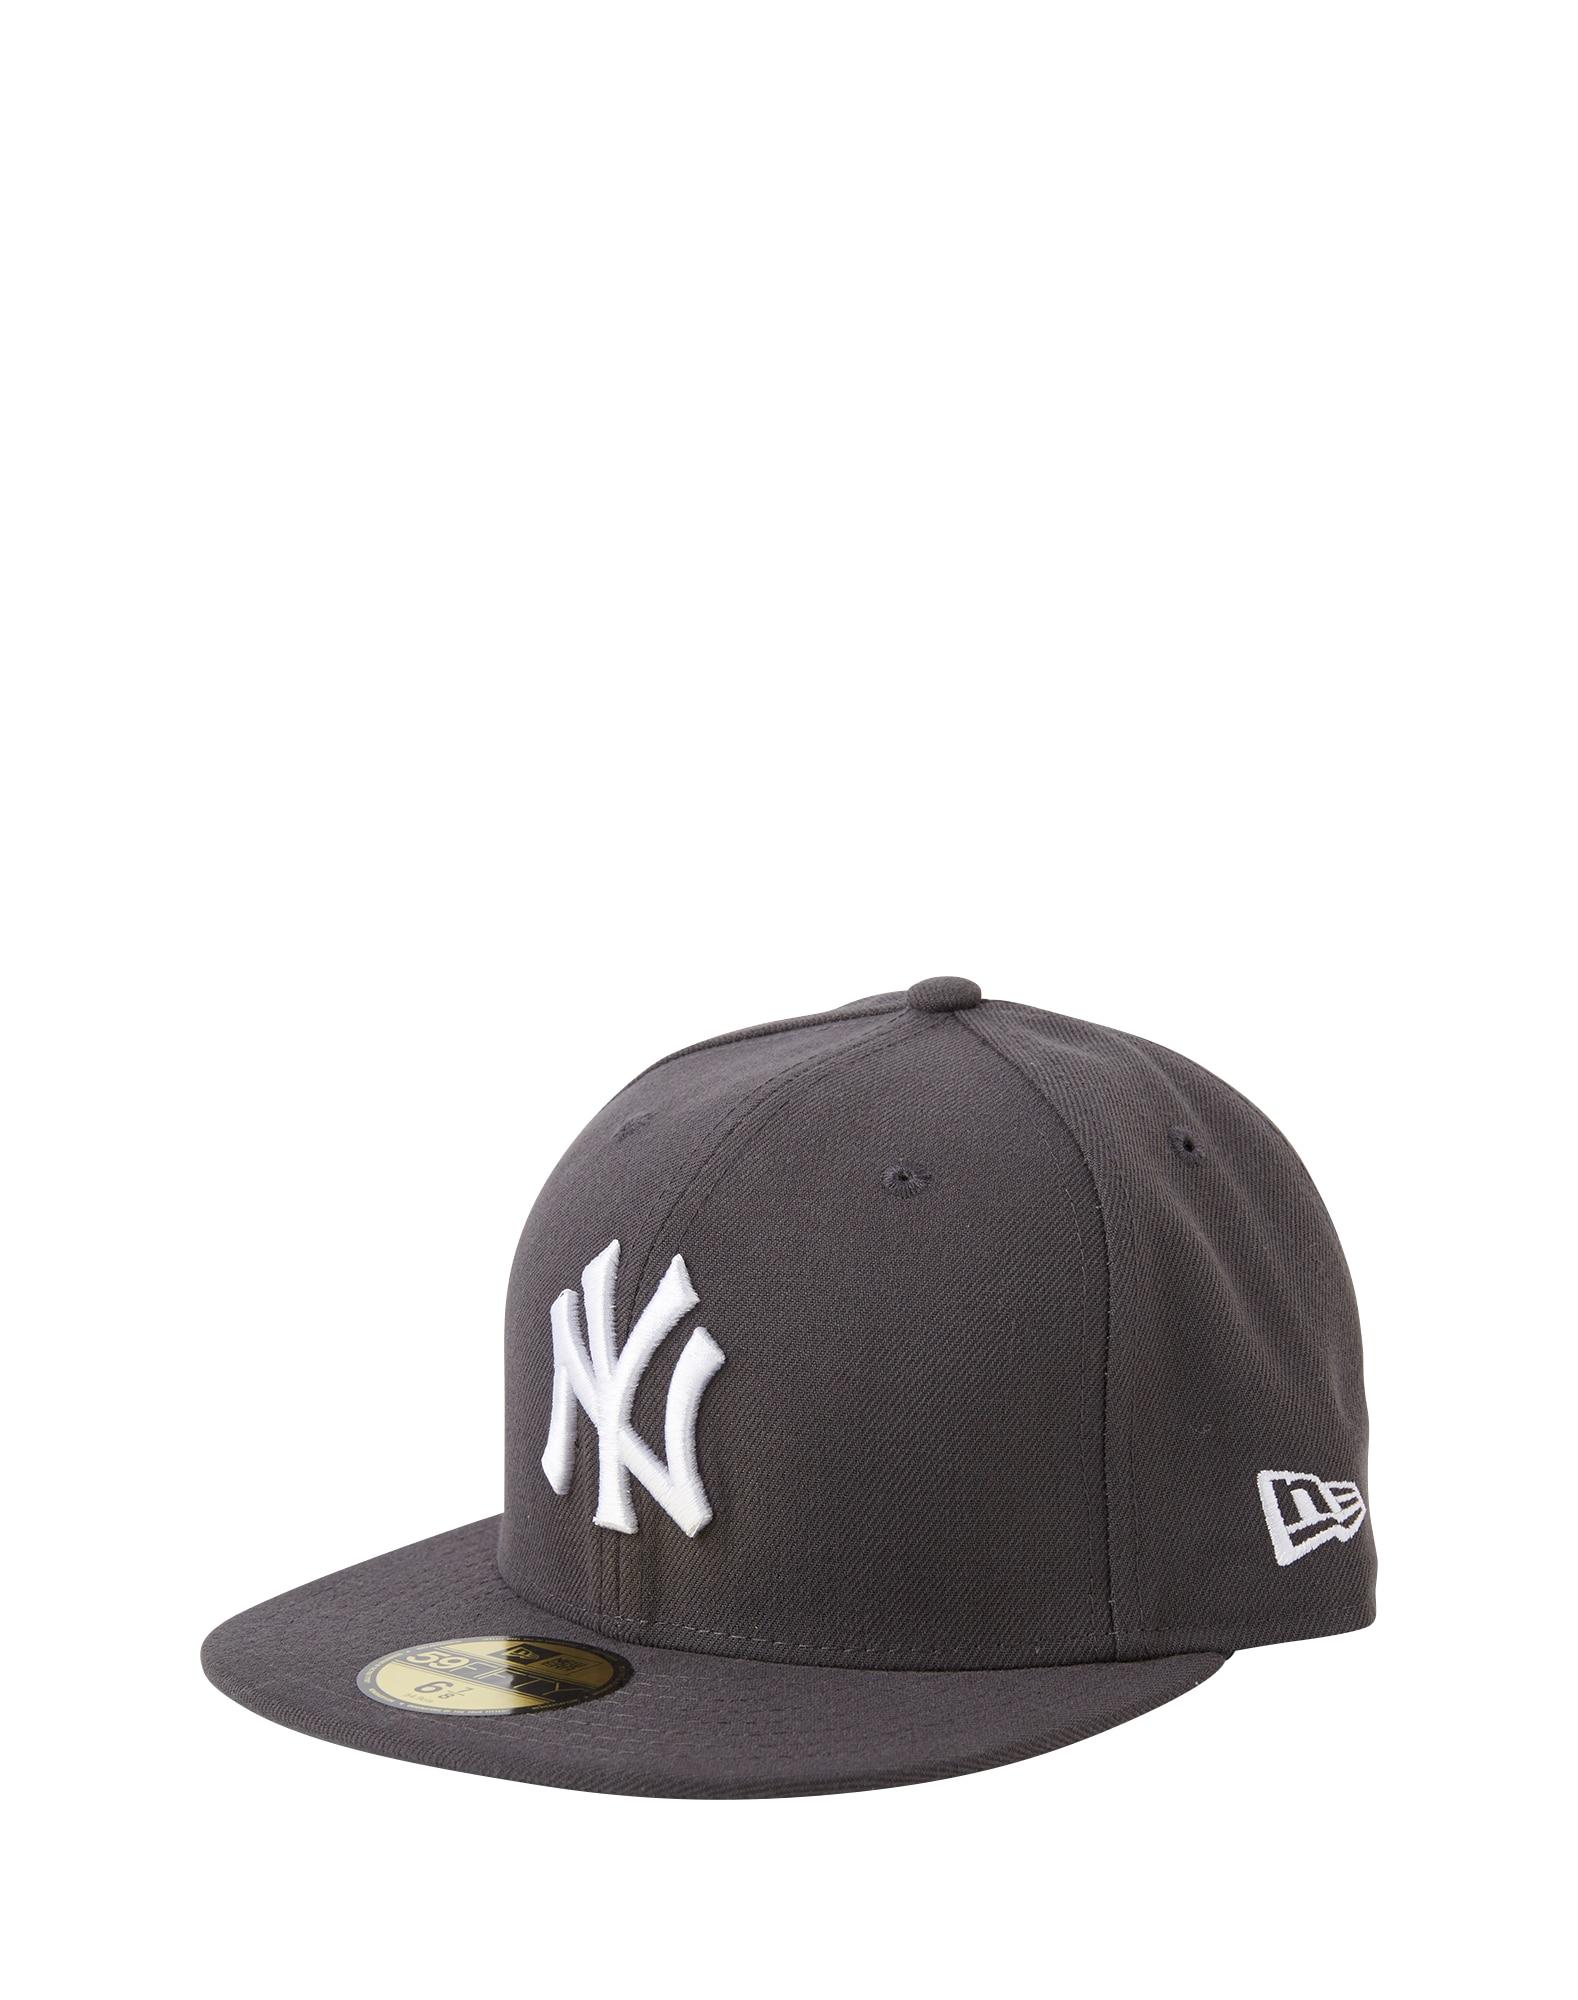 Kšiltovka 59FIFTY MLB Basic New York Yankees šedá tmavě šedá NEW ERA